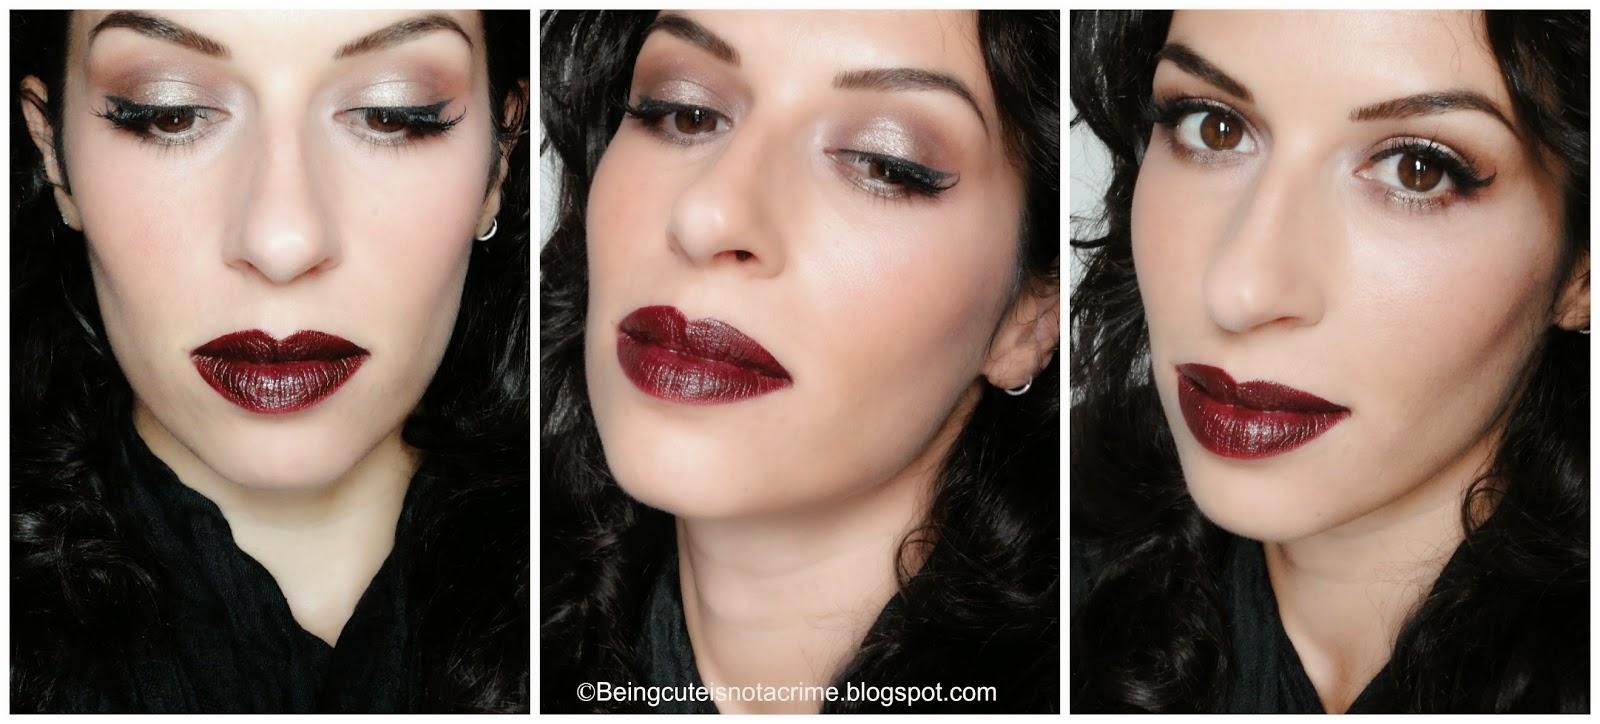 http://beingcuteisnotacrime.blogspot.nl/2014/11/vampy-lips-autumn-look-nikkietutorials.html